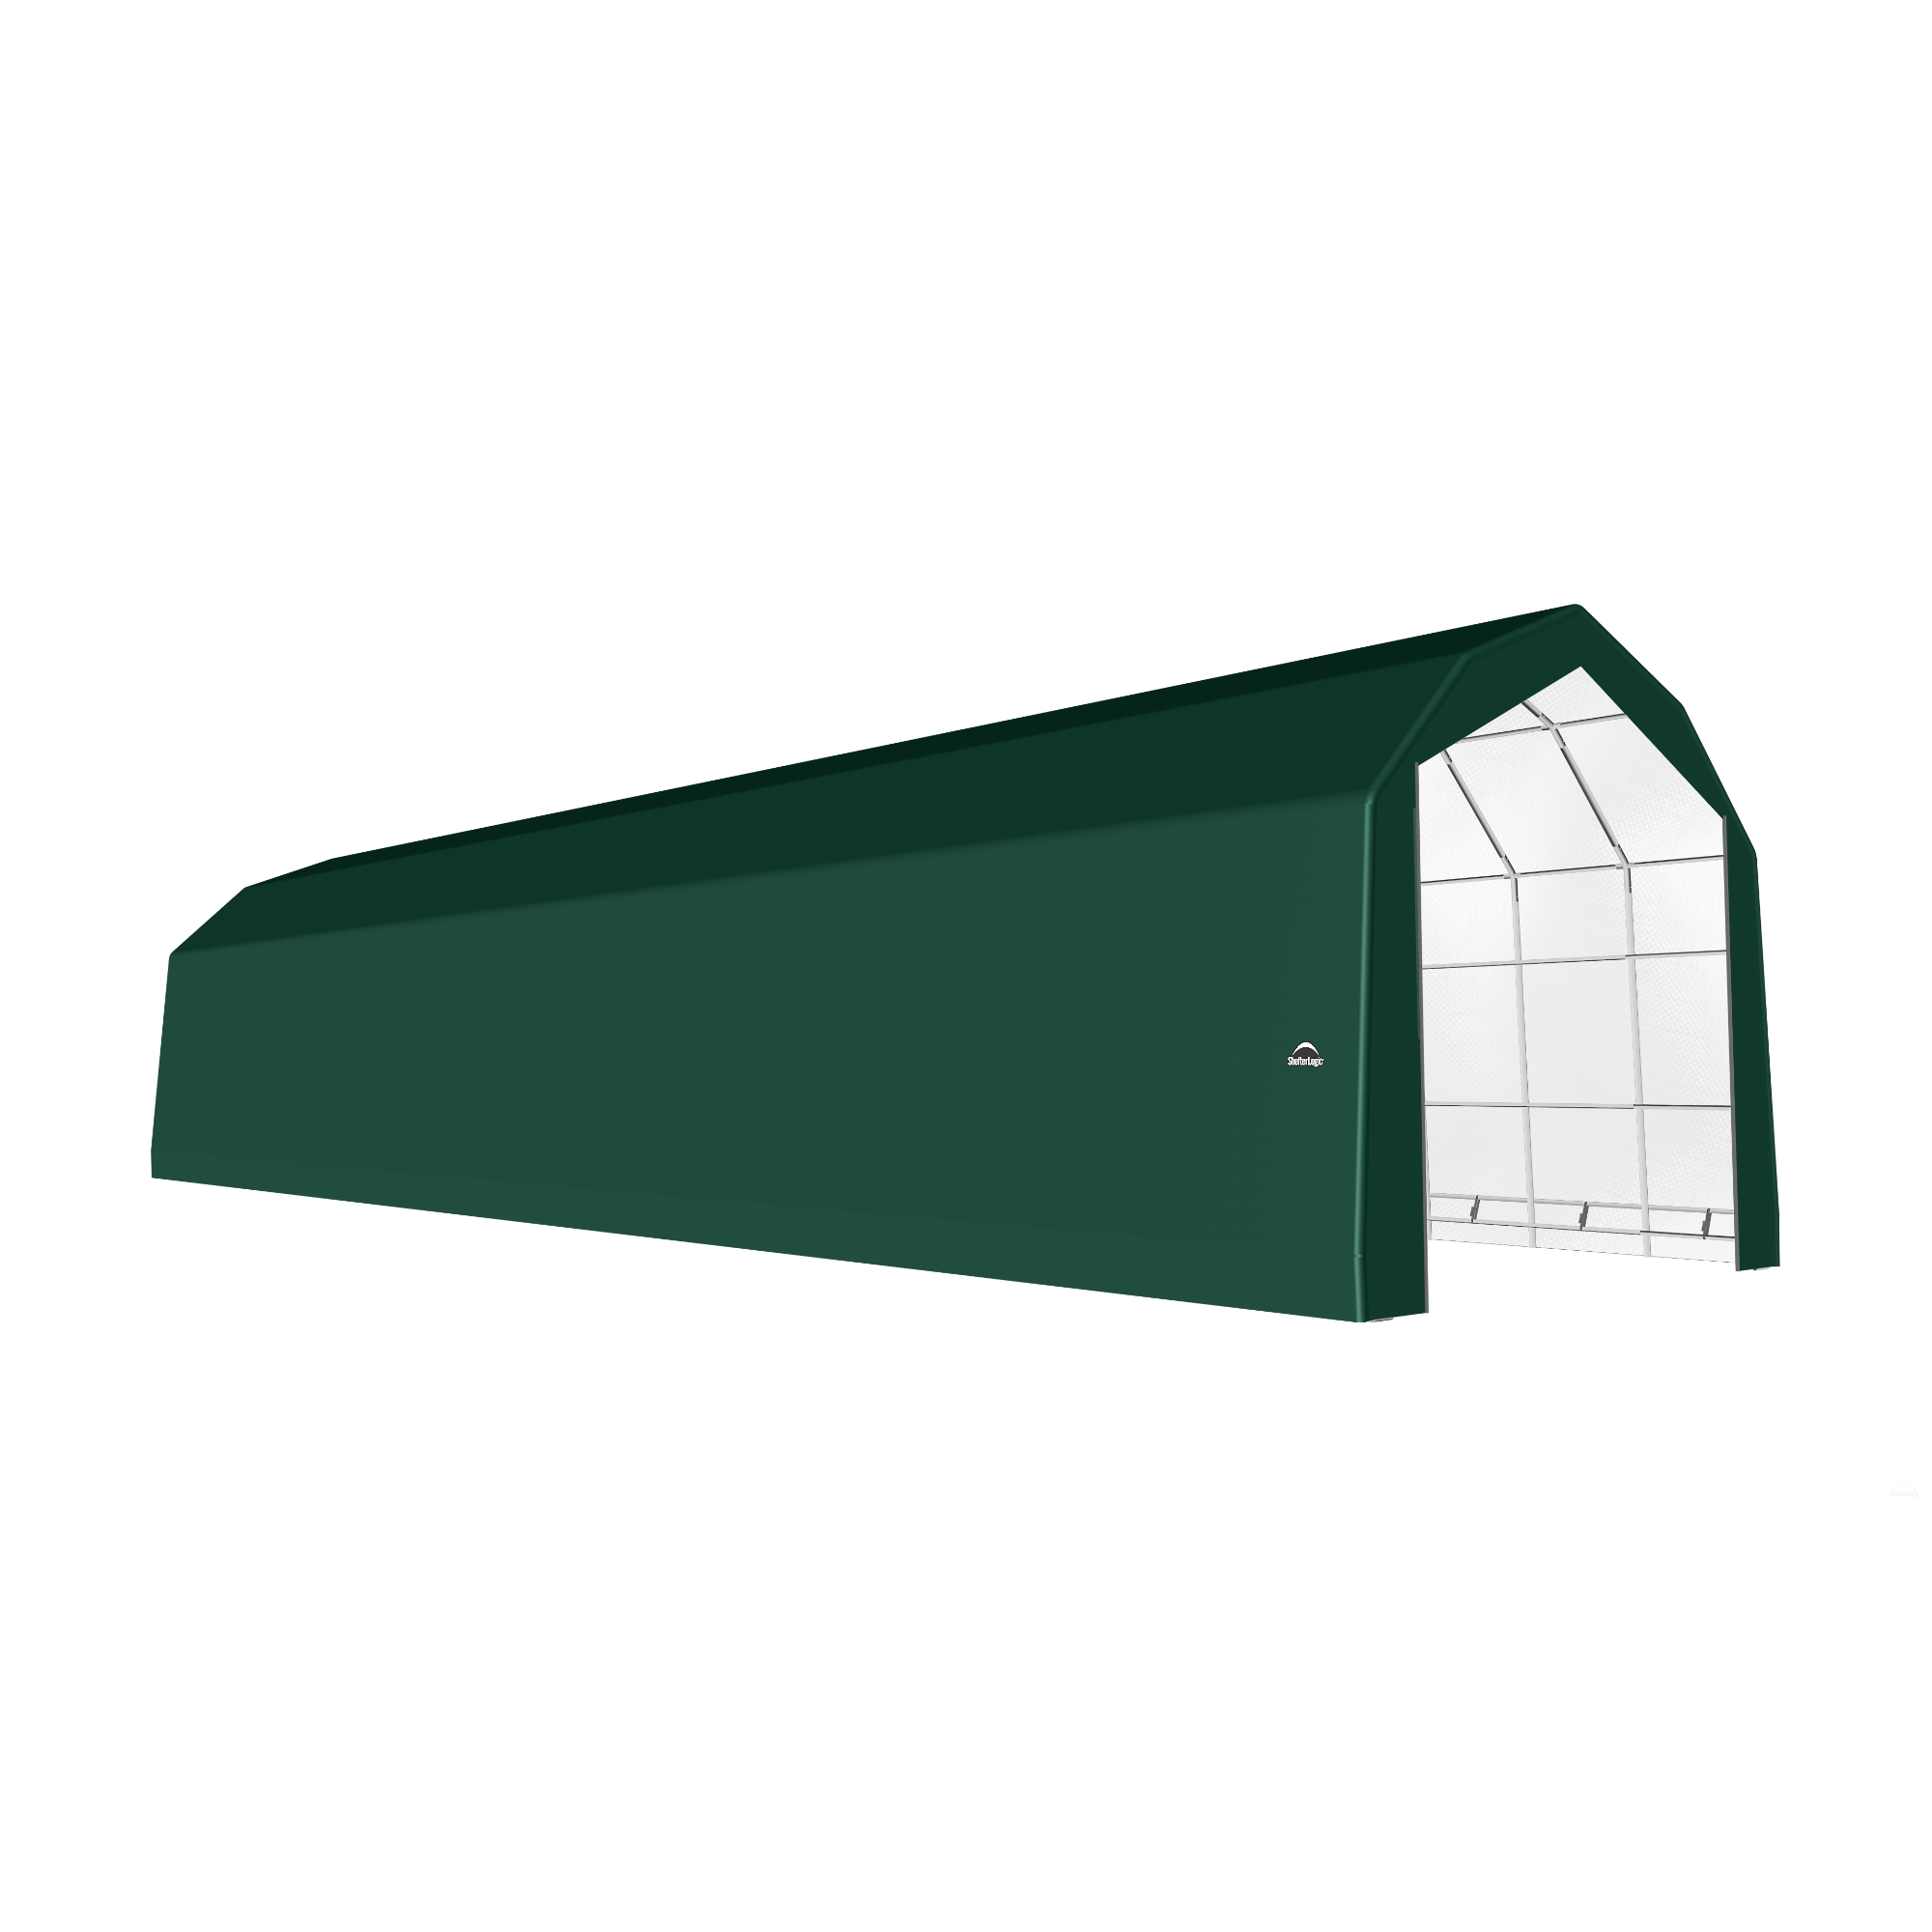 SP Barn 20X72X18 Green 14 oz PE Shelter